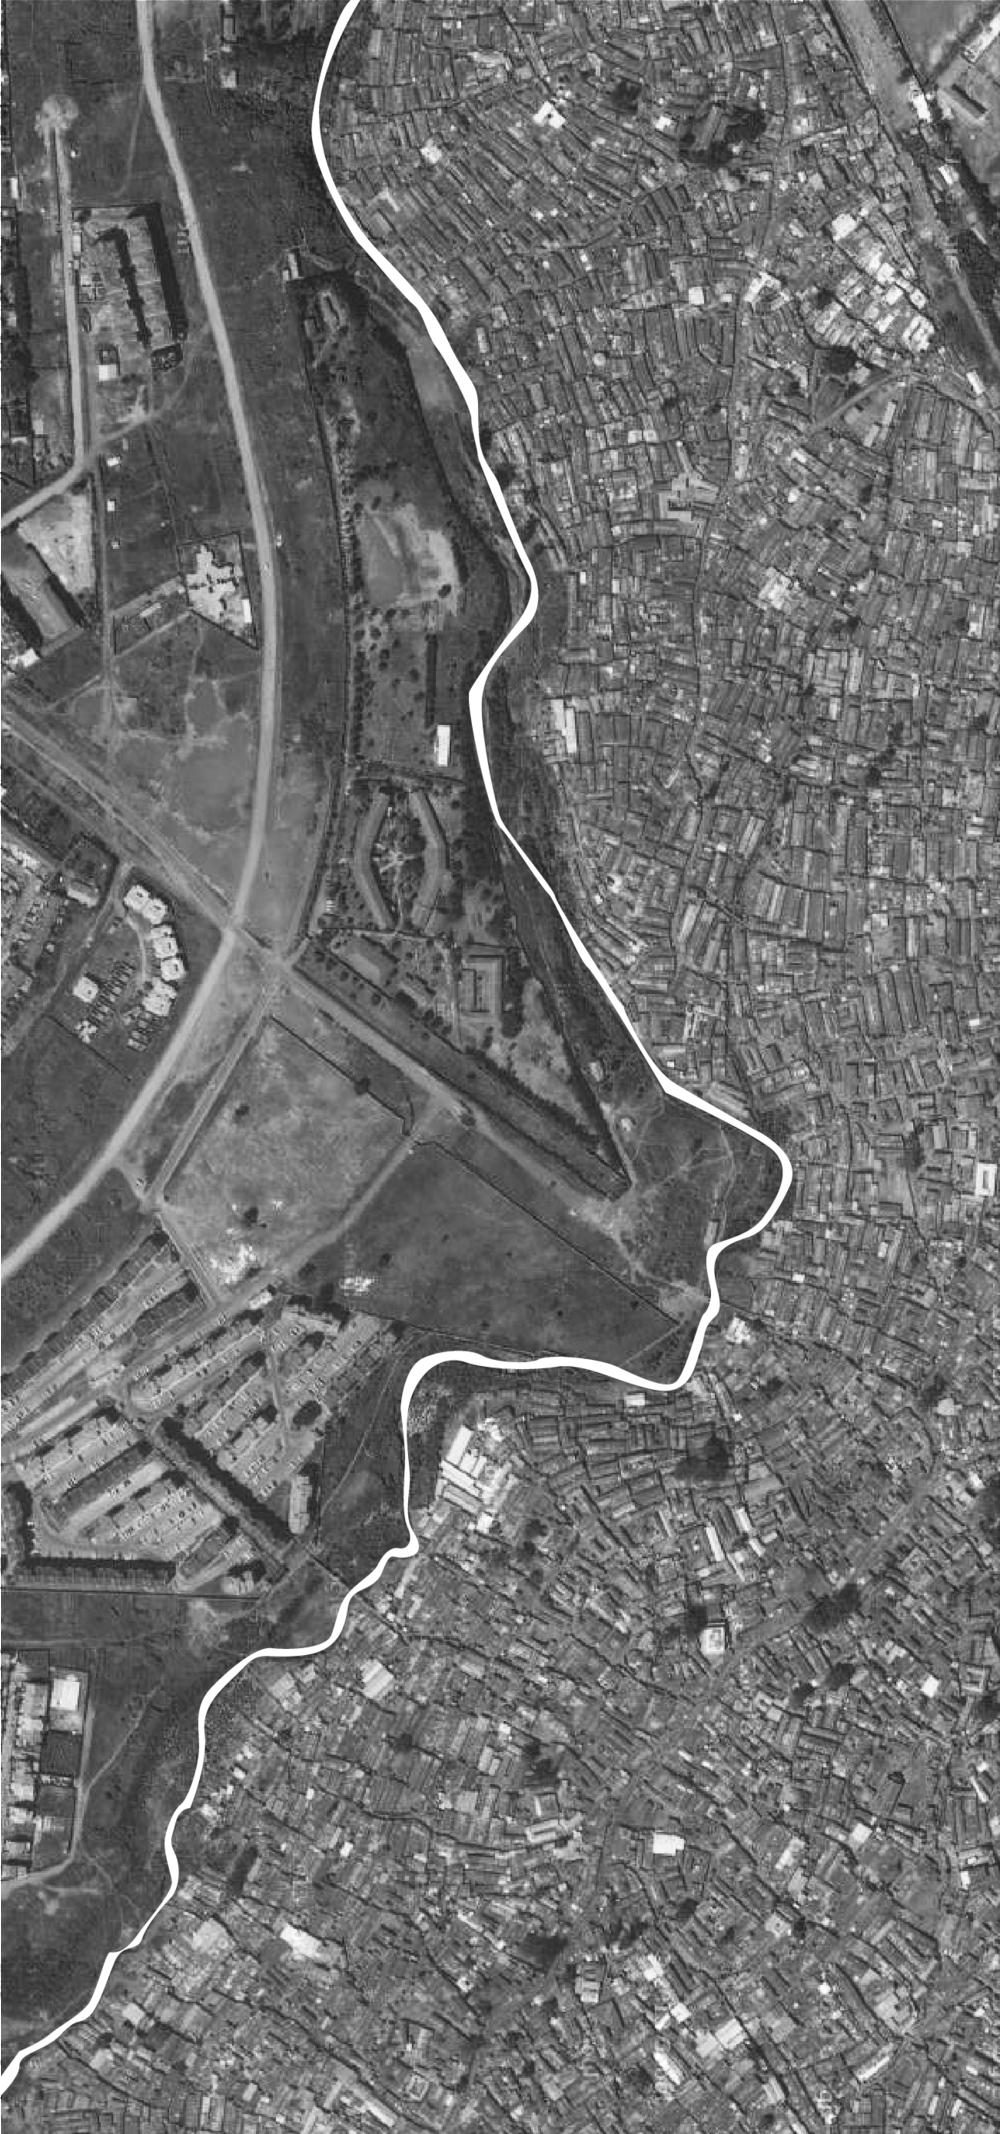 05 Satellite image of Kibera informal settlement: the river as the 'separator' (source: Google Maps 2013)